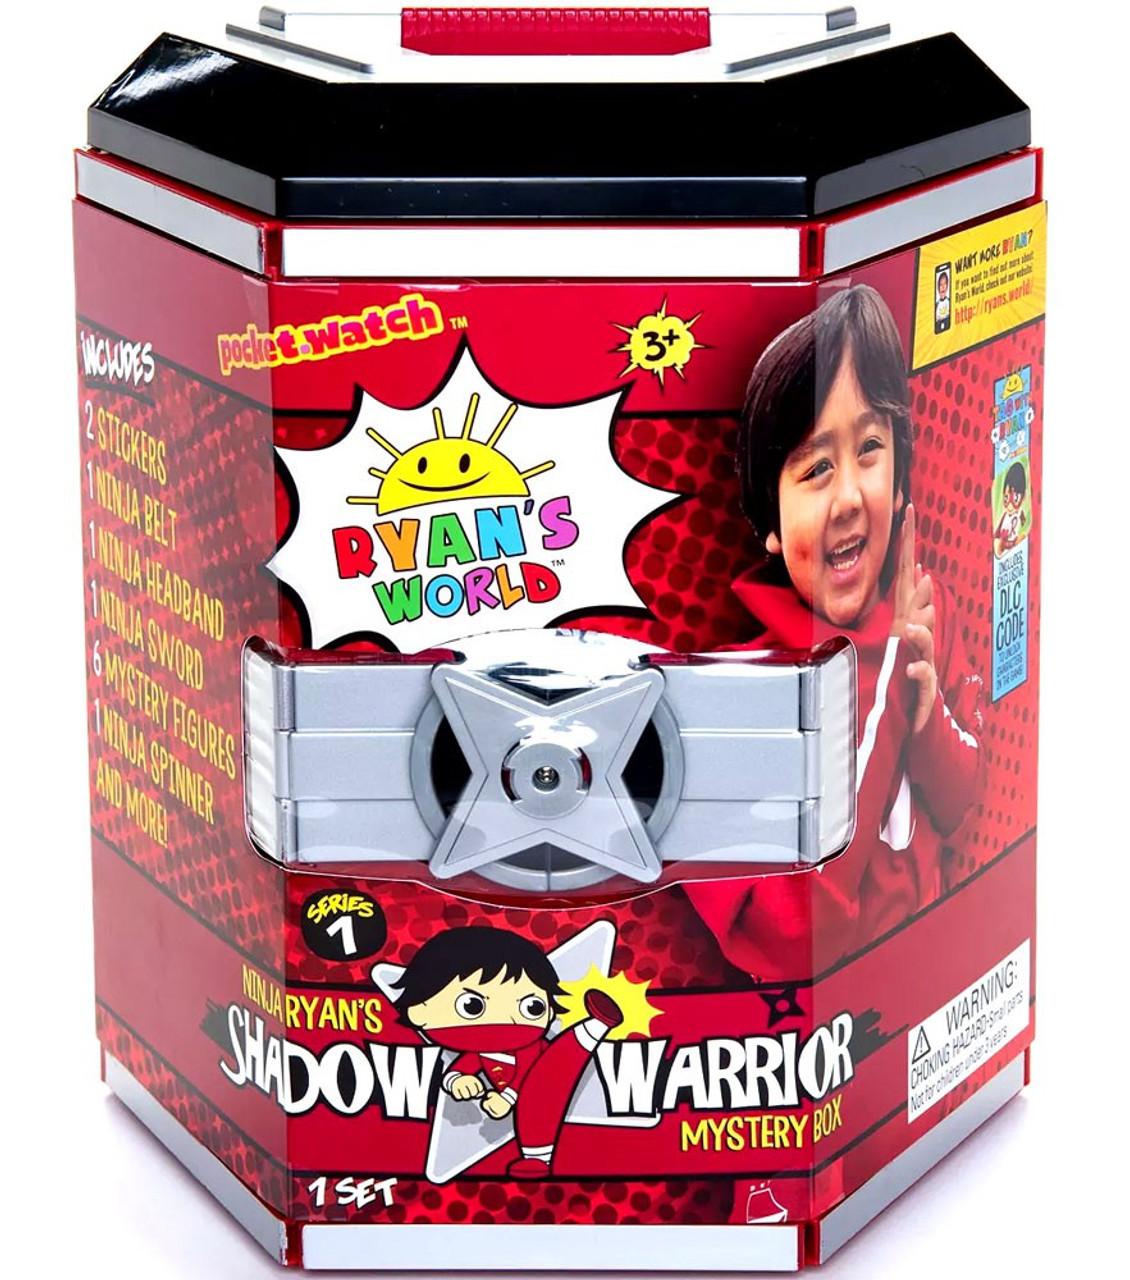 ryan mystery ninja warrior shadow ryans exclusive figures target martial arts gear walmart spinner surprises surprise packaging toy toywiz robo